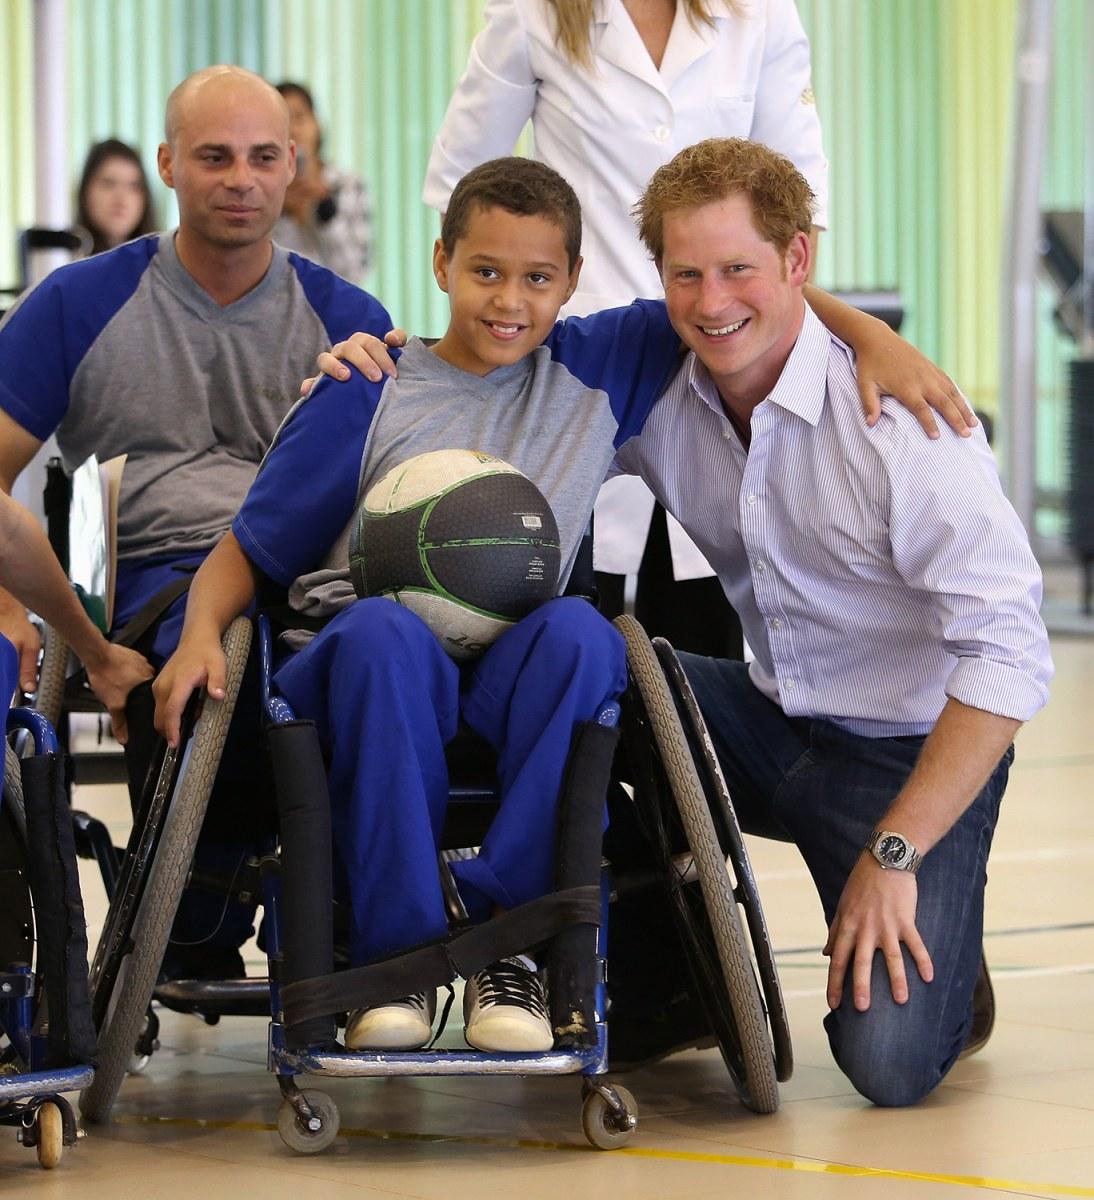 Who Is Cressida Bonas? The Socialite Who Won Prince Harry